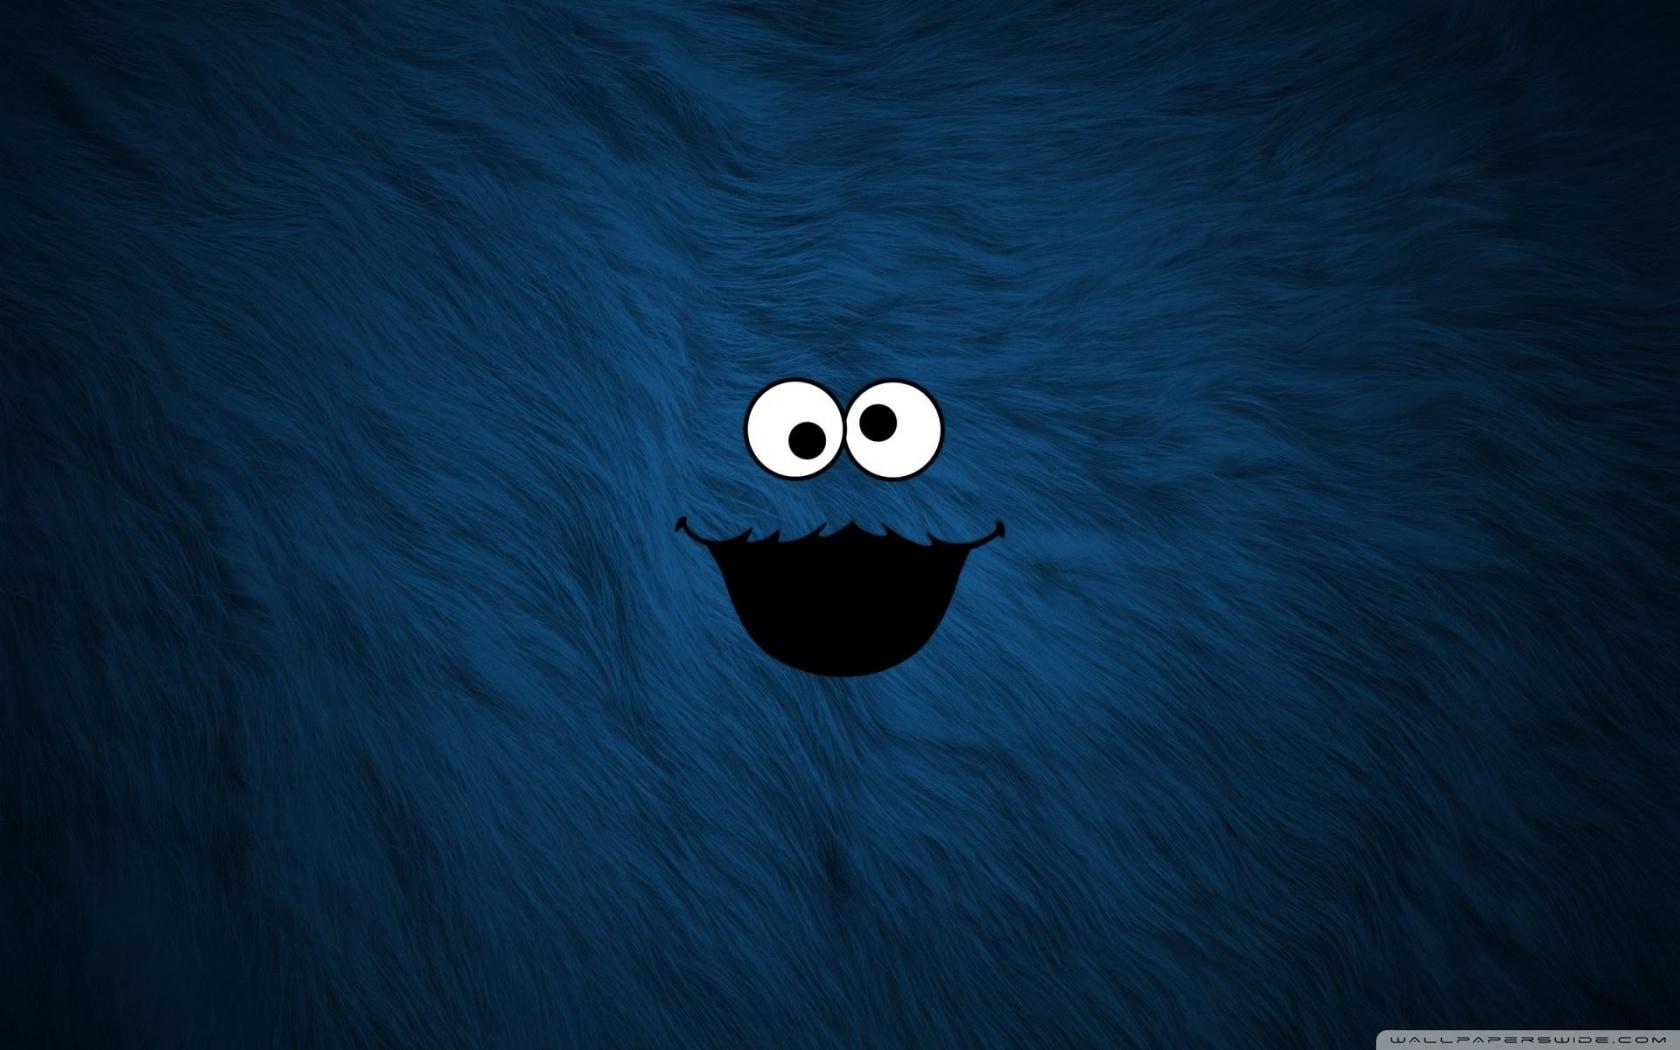 Fall 4k Wallpaper Cookie Monster Background 4k Hd Desktop Wallpaper For 4k